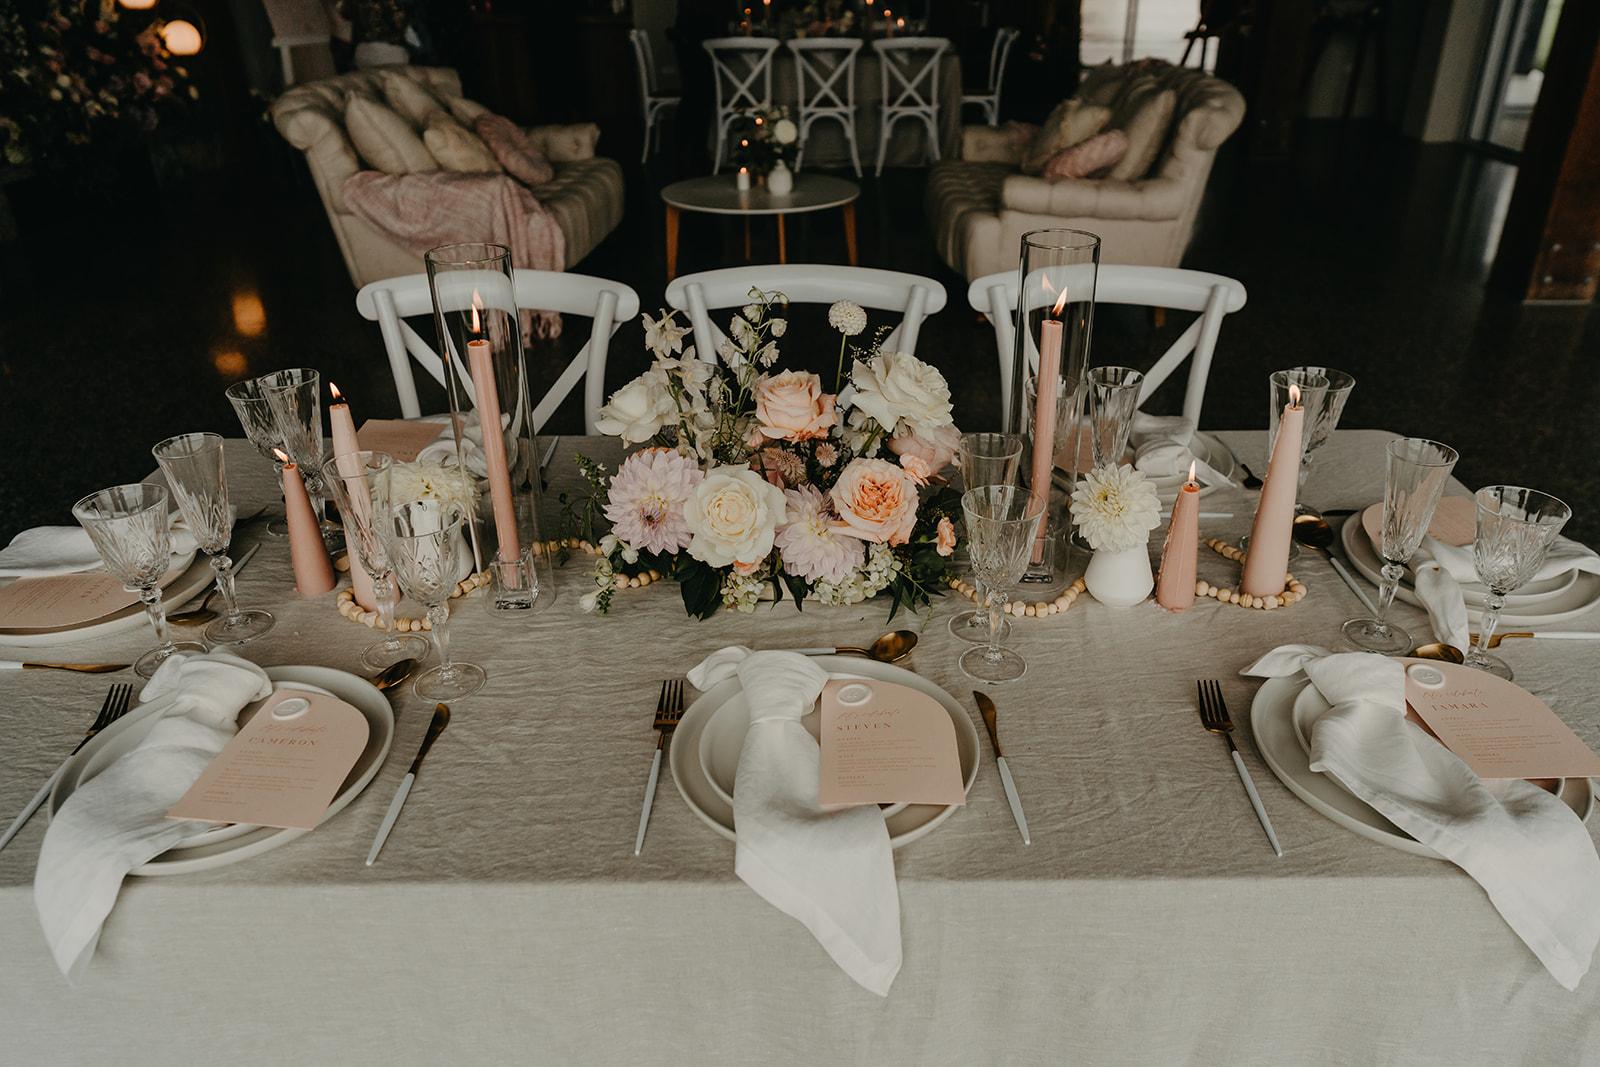 images by angela cannavo photography sunshine coast wedding venue and styling